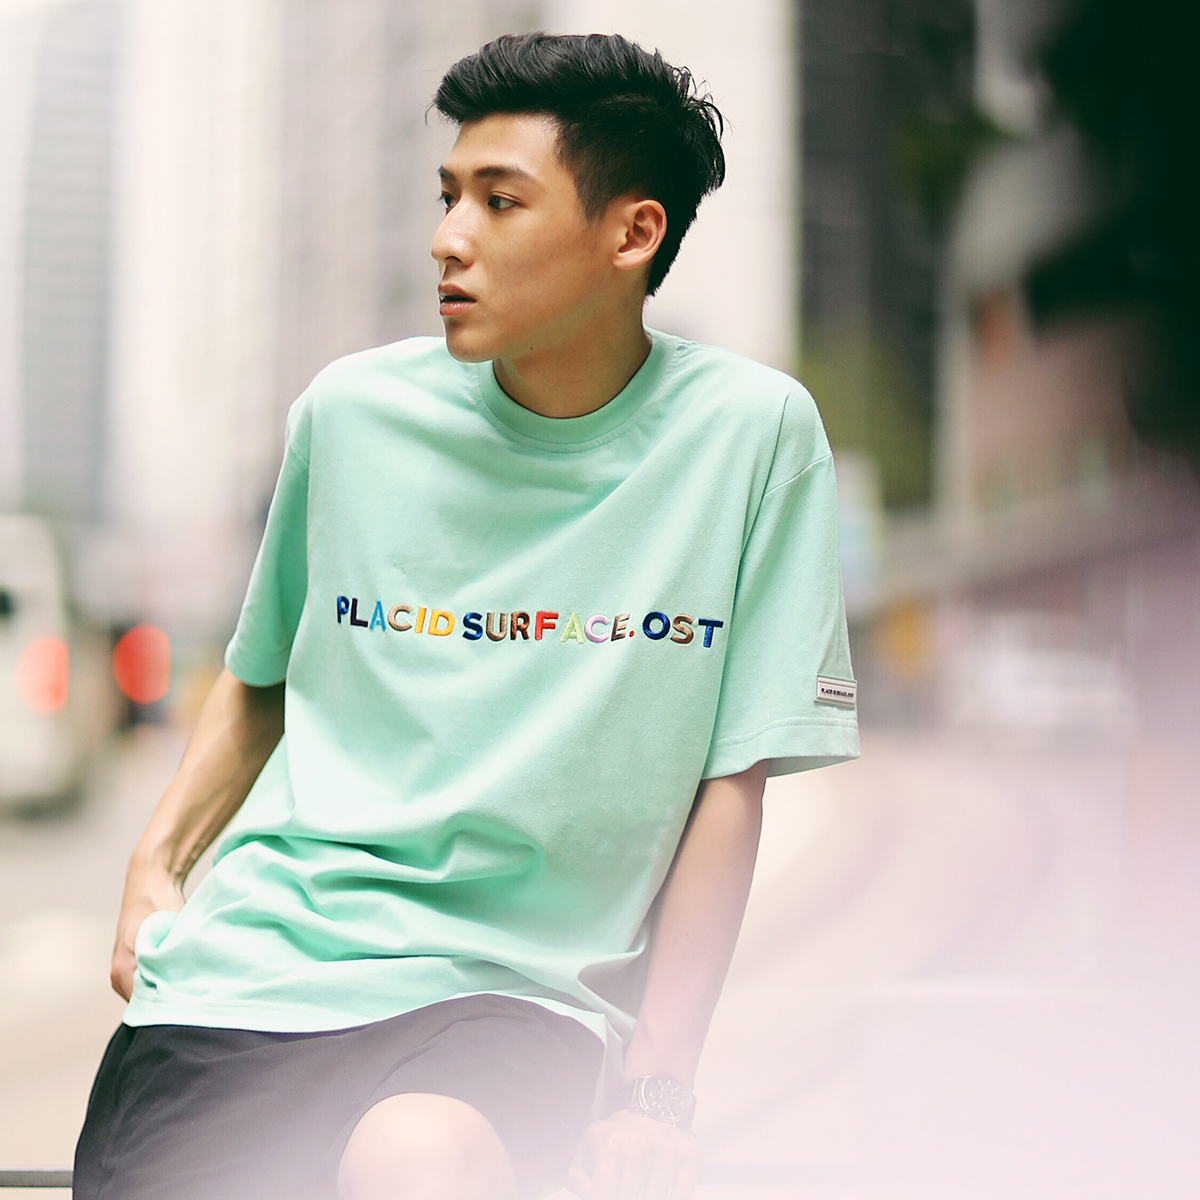 PSO Brand 品牌绣花款原创潮牌纯棉圆领半袖彩虹短袖字母T恤男